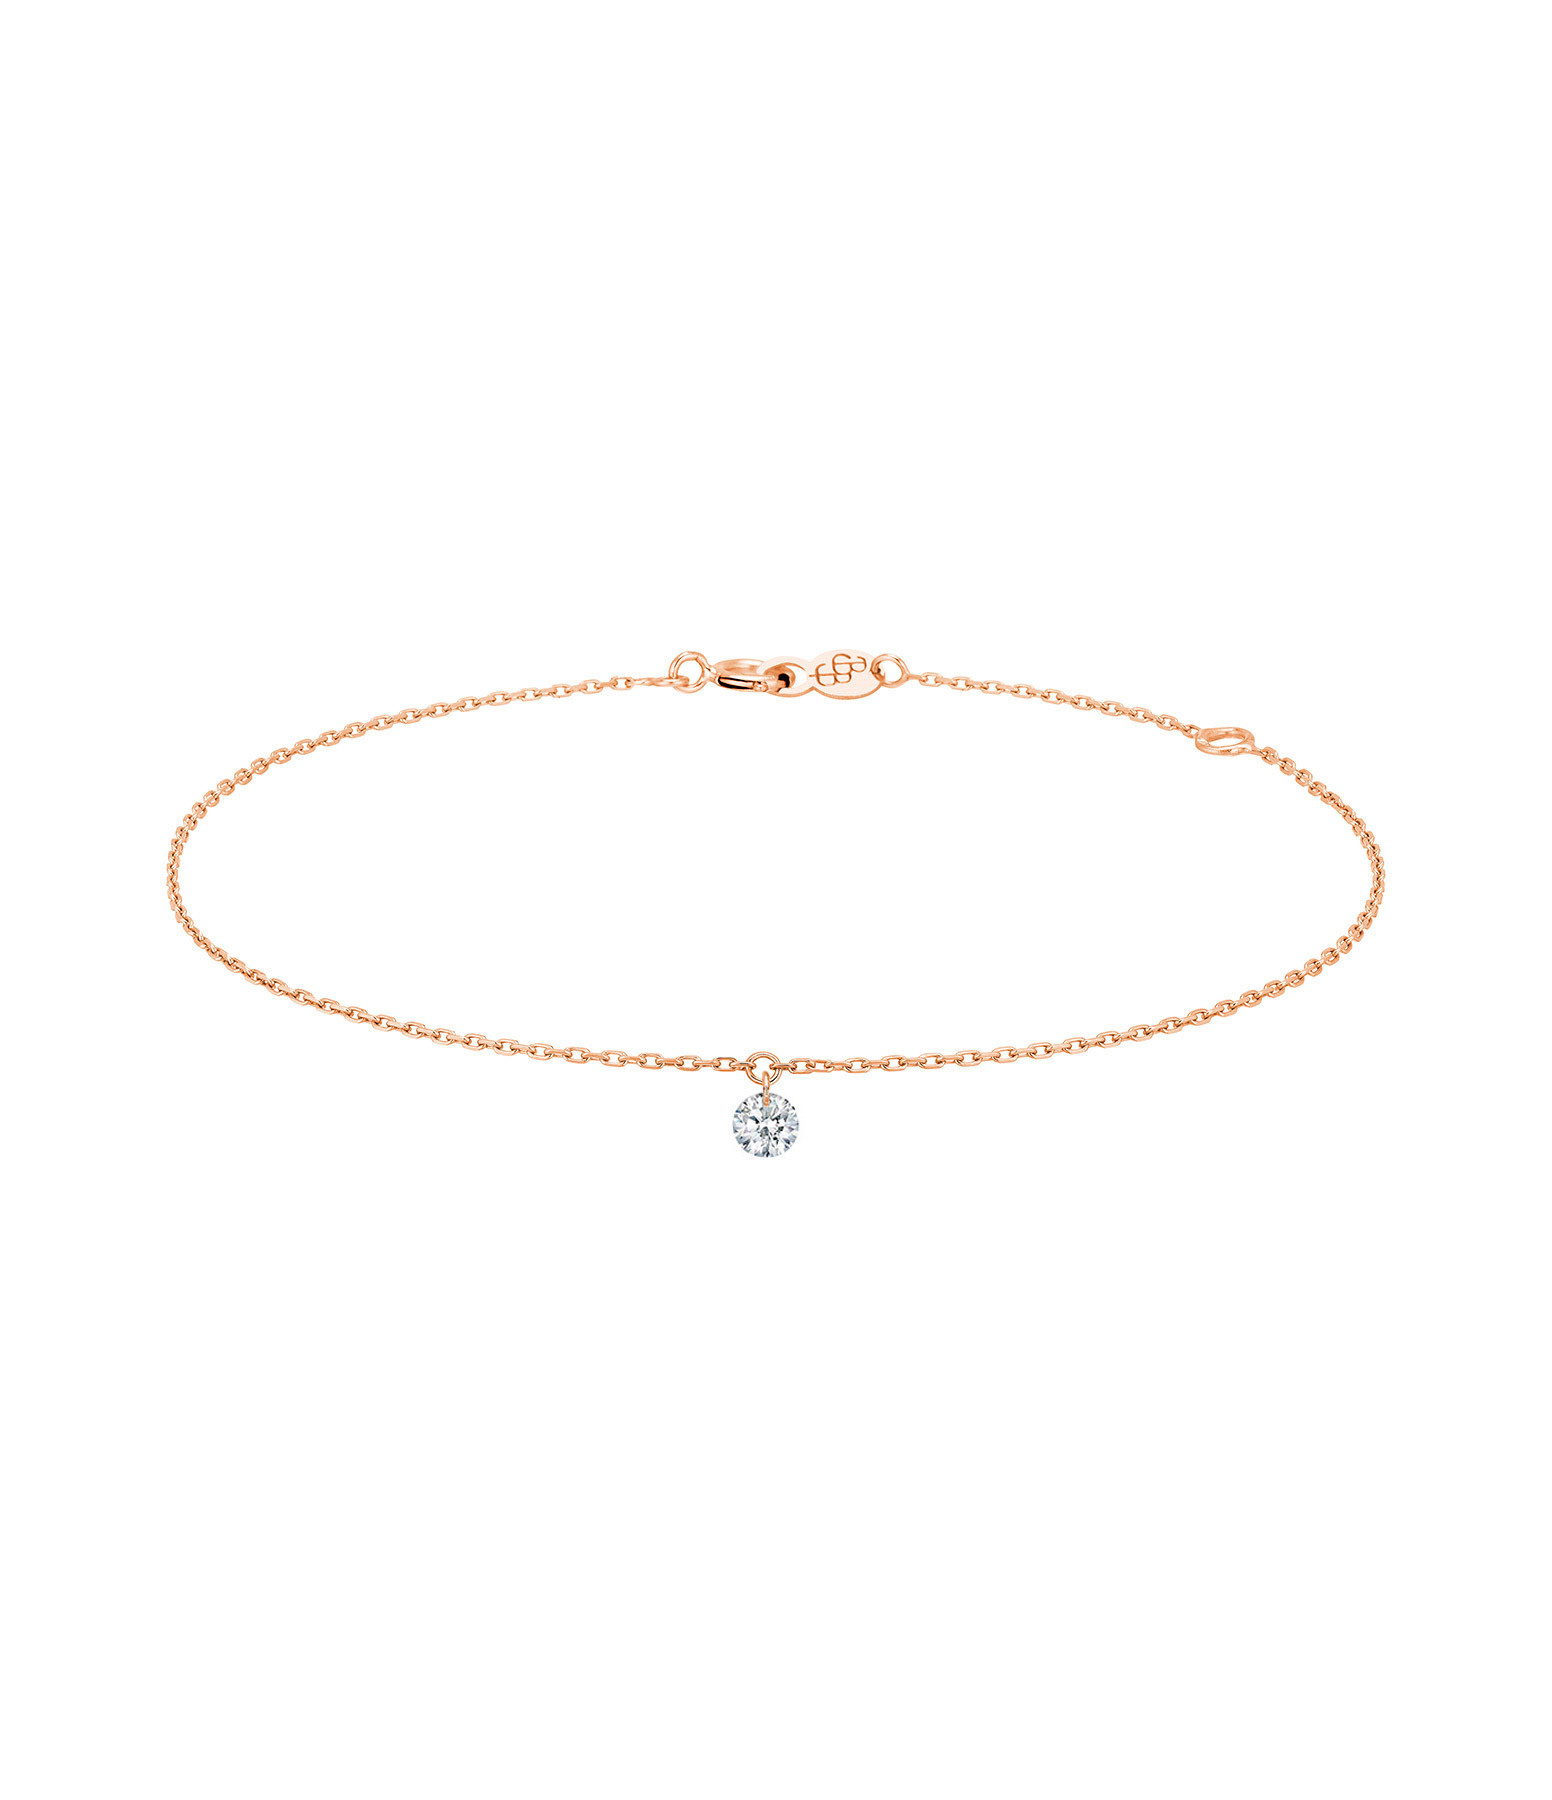 LA BRUNE & LA BLONDE - Bracelet 360° Diamant Brillant 0,10 Or Rose